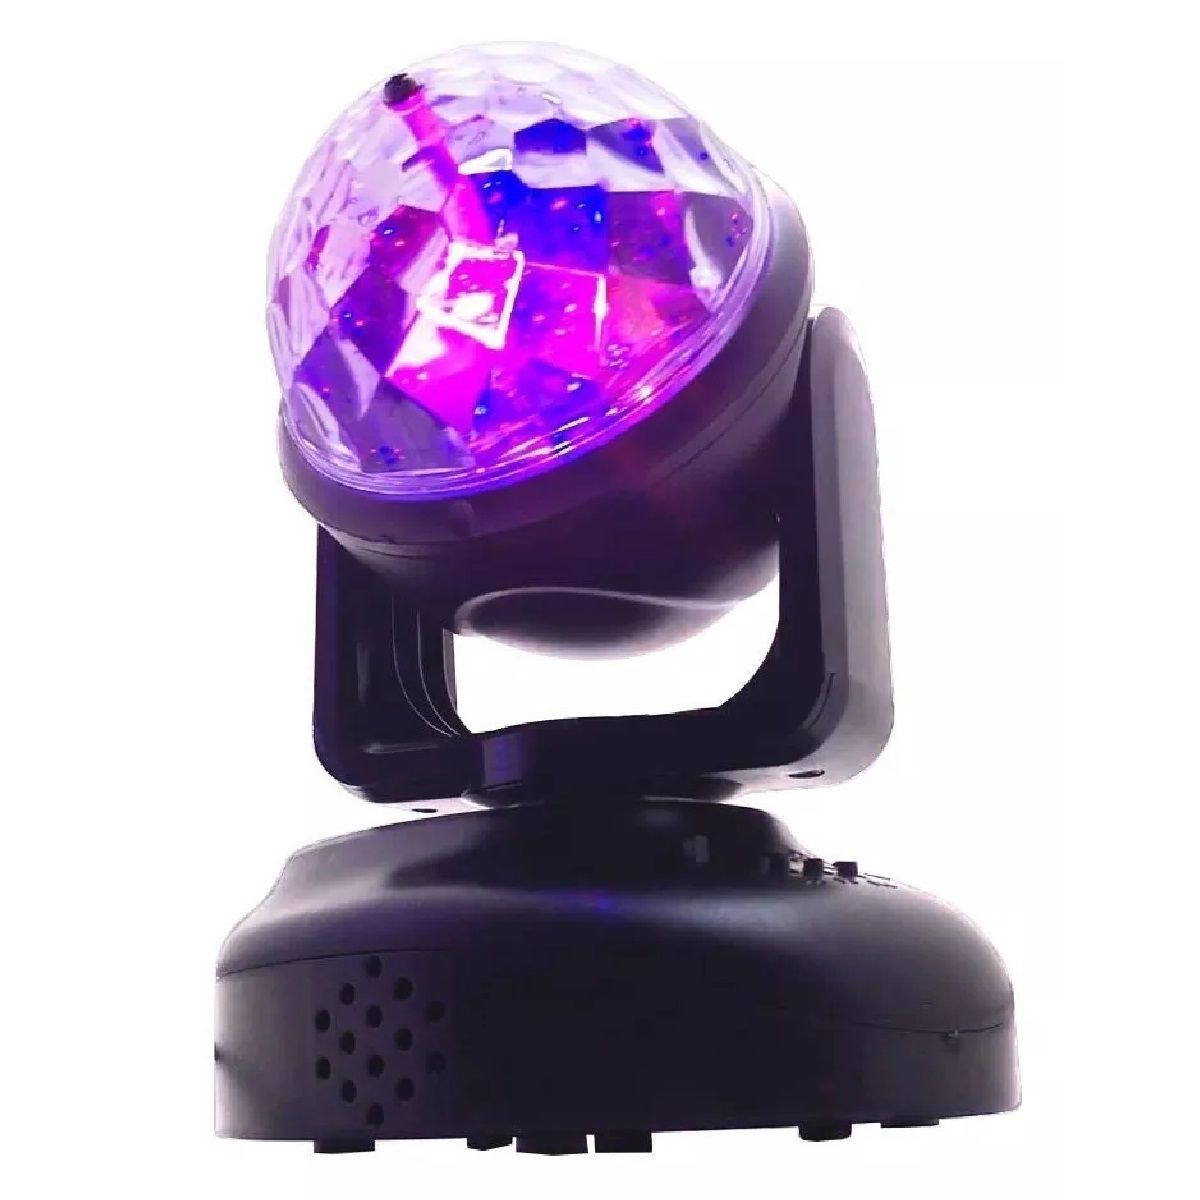 Kit Mini Moving Head RGB + Strobo 12 LEDs Branco Rítmico + Canhão Luz 18 LEDs - HL-080+12LEDBR+18LEDSLIM